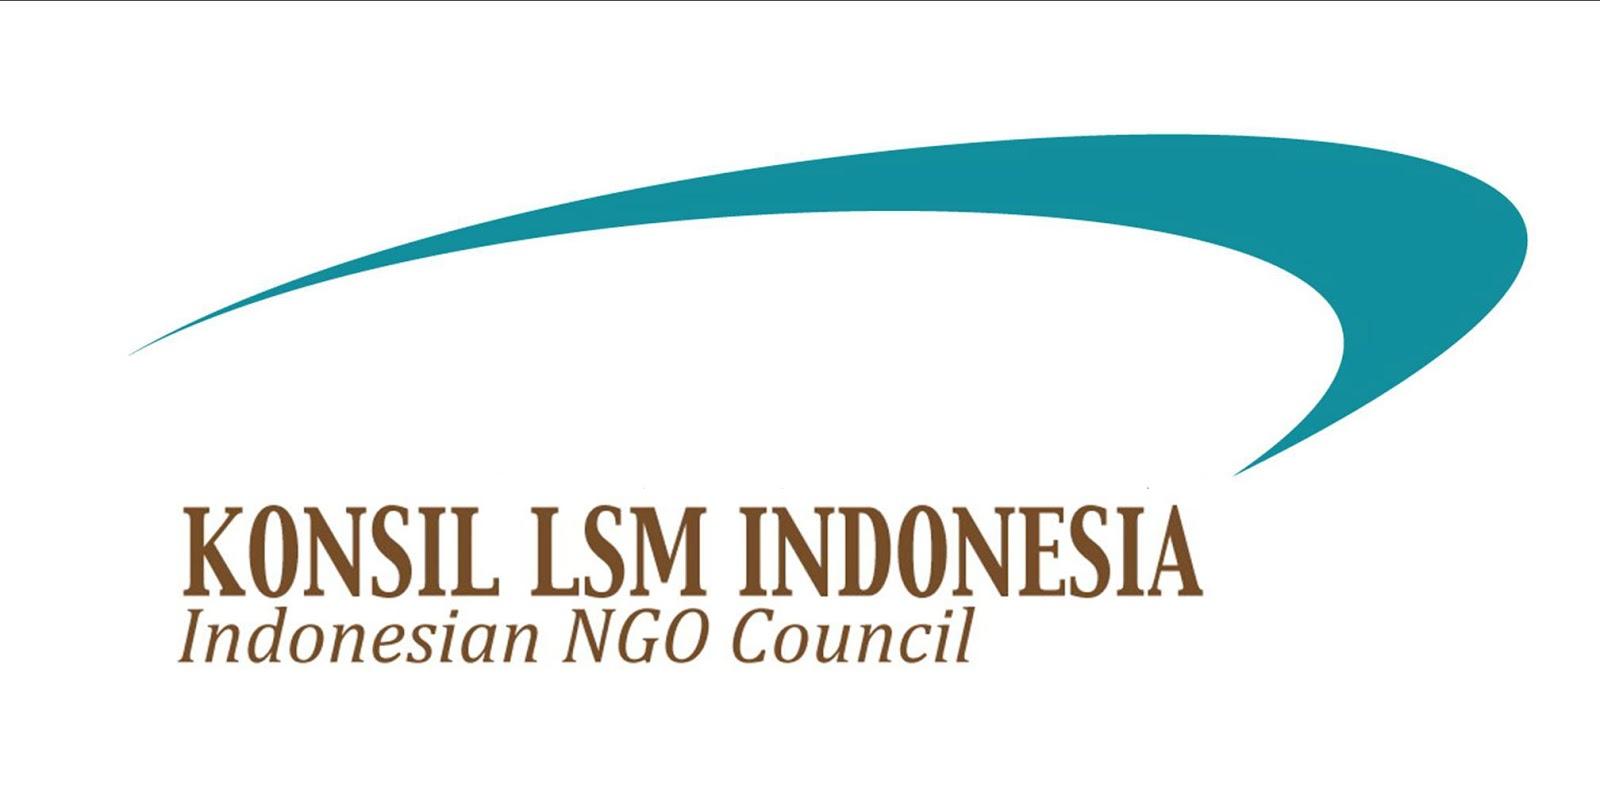 Konsil-LSM-Indonesia